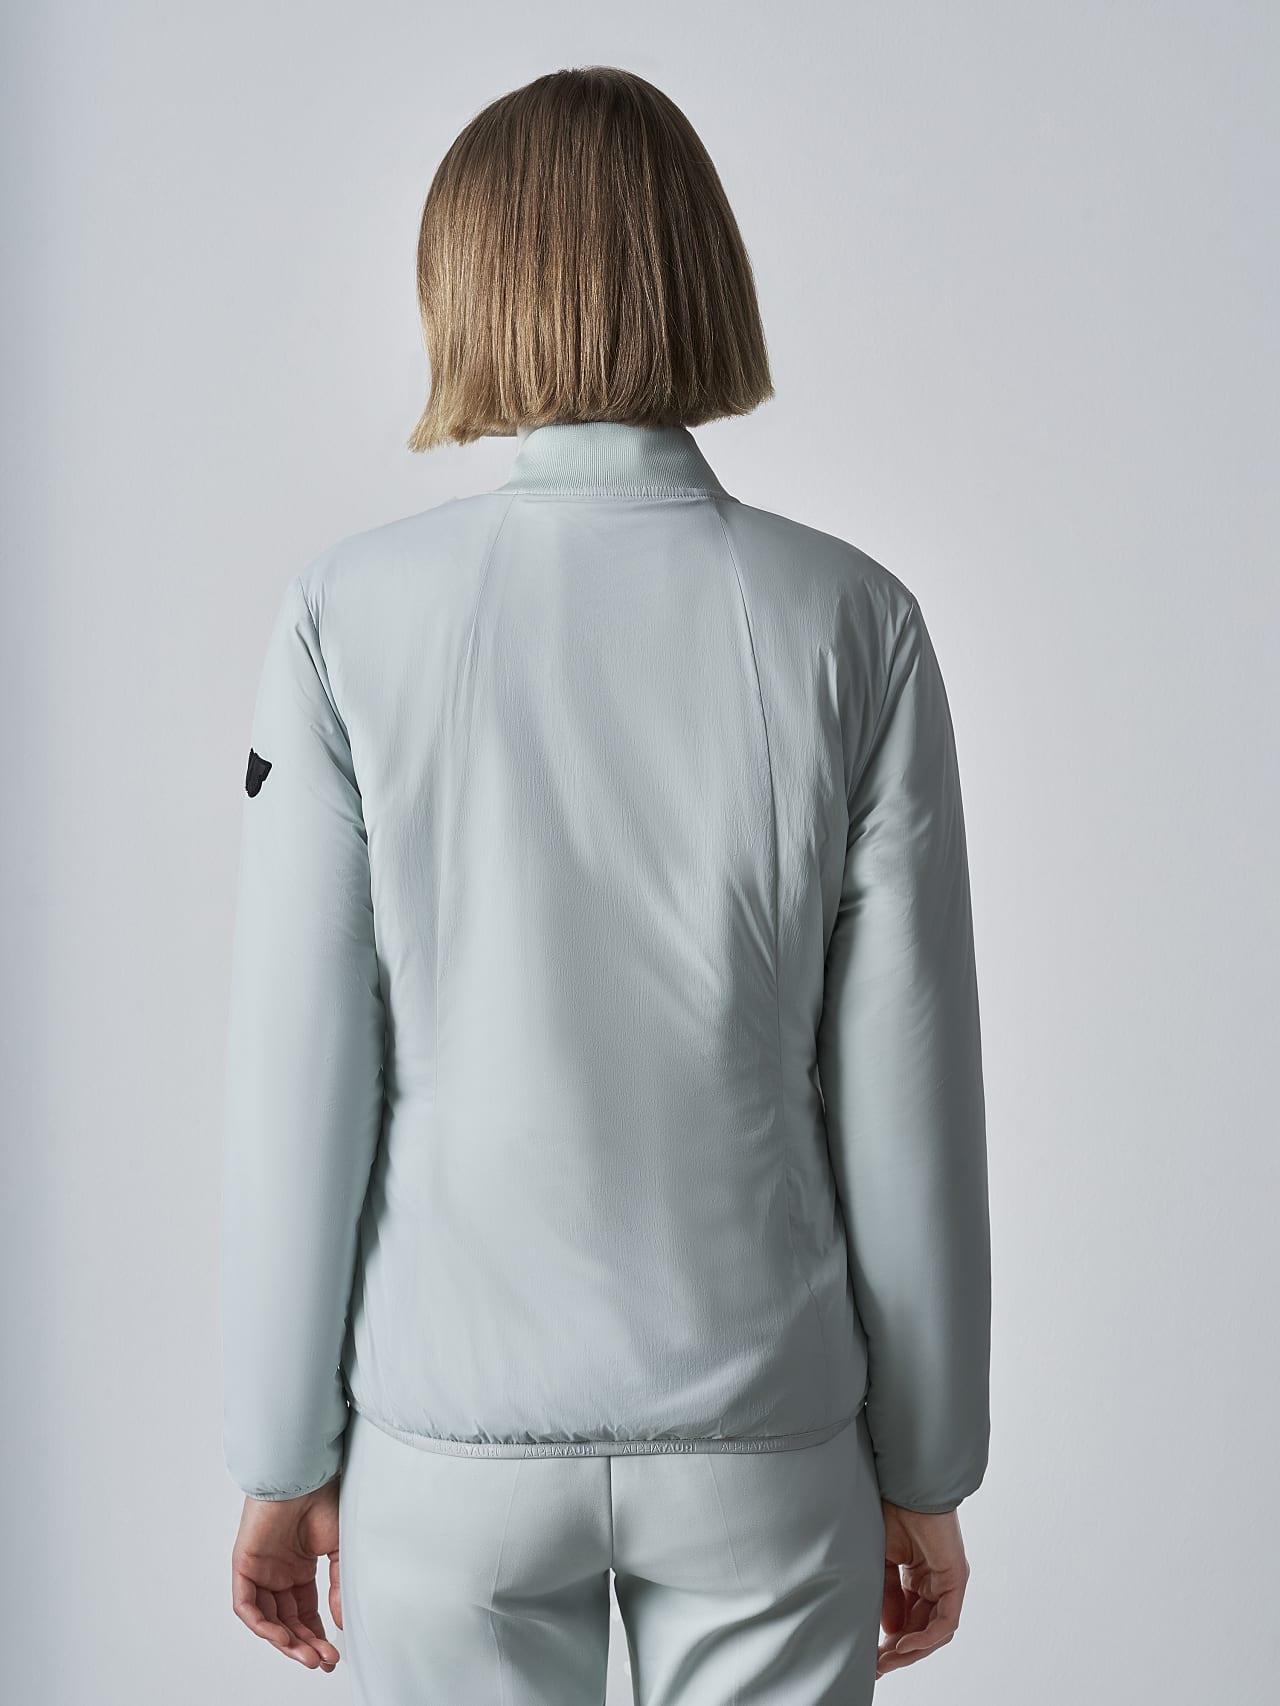 OVAS V4.Y5.02 Padded PrimaLoft® Jacket Pale Blue  Front Main Alpha Tauri